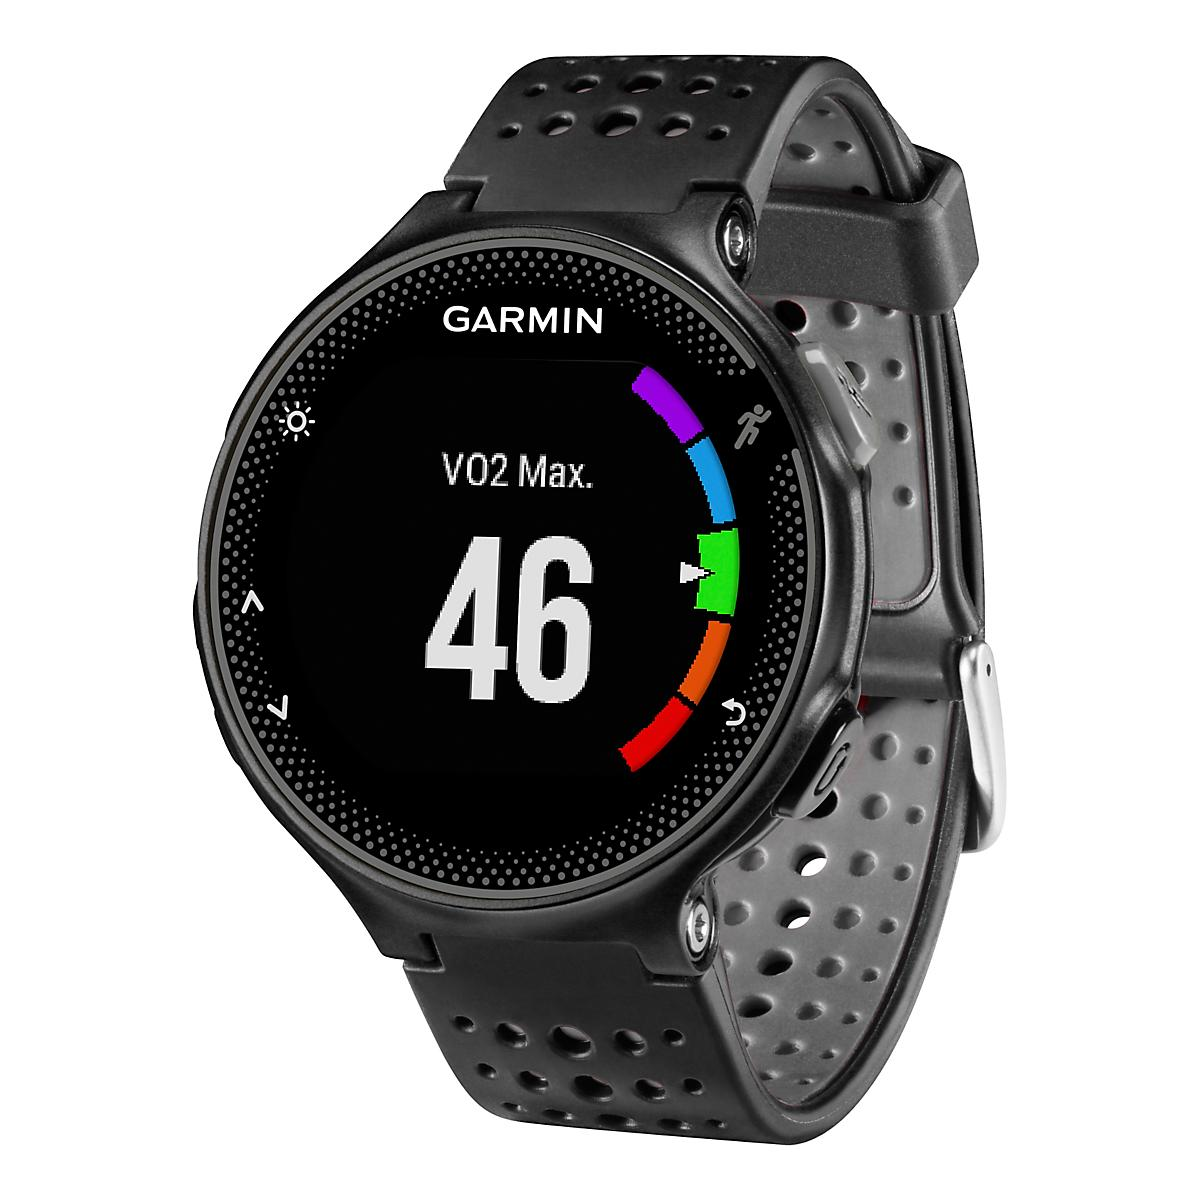 Watch with wrist hrm - Garmin Forerunner 235 Gps Running Watch With Hrm